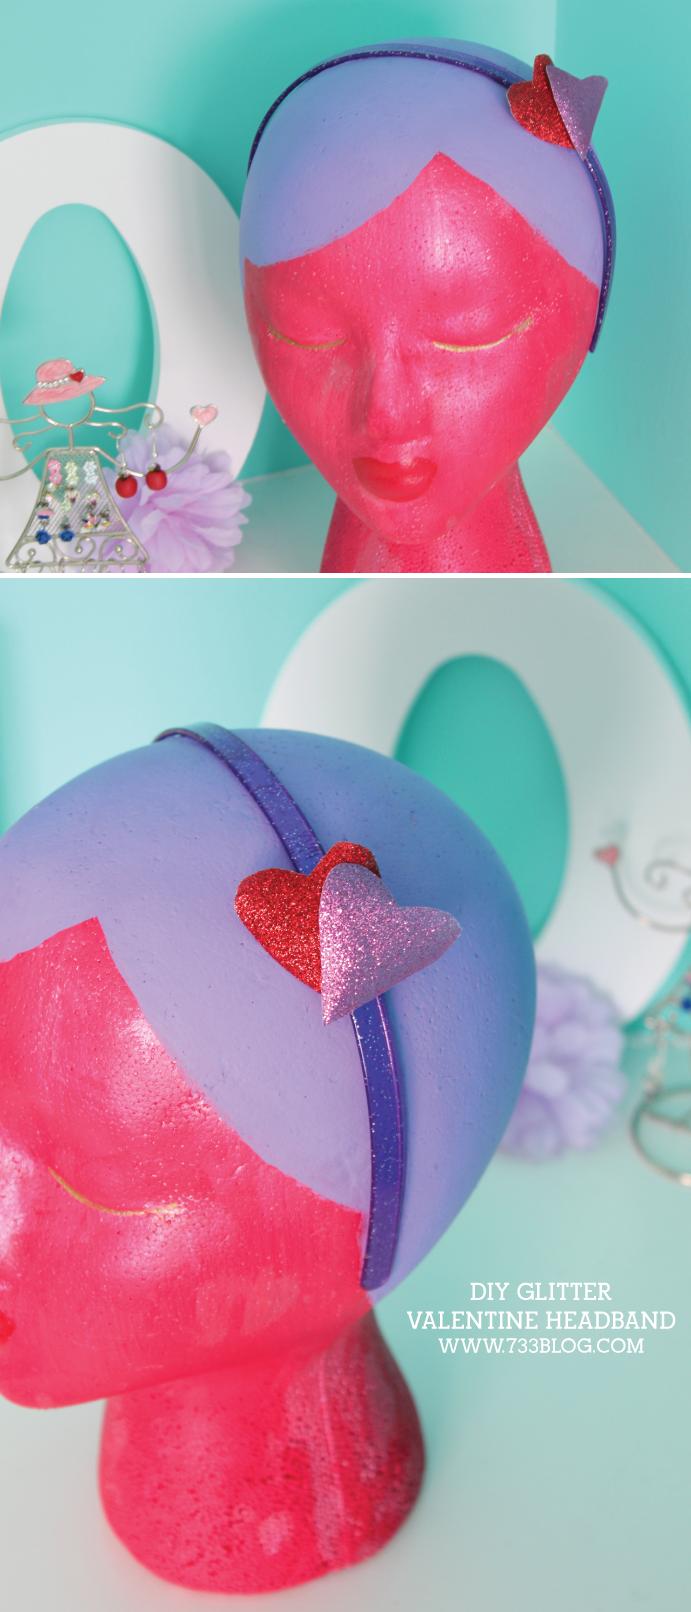 DIY Glitter Valentine Headband